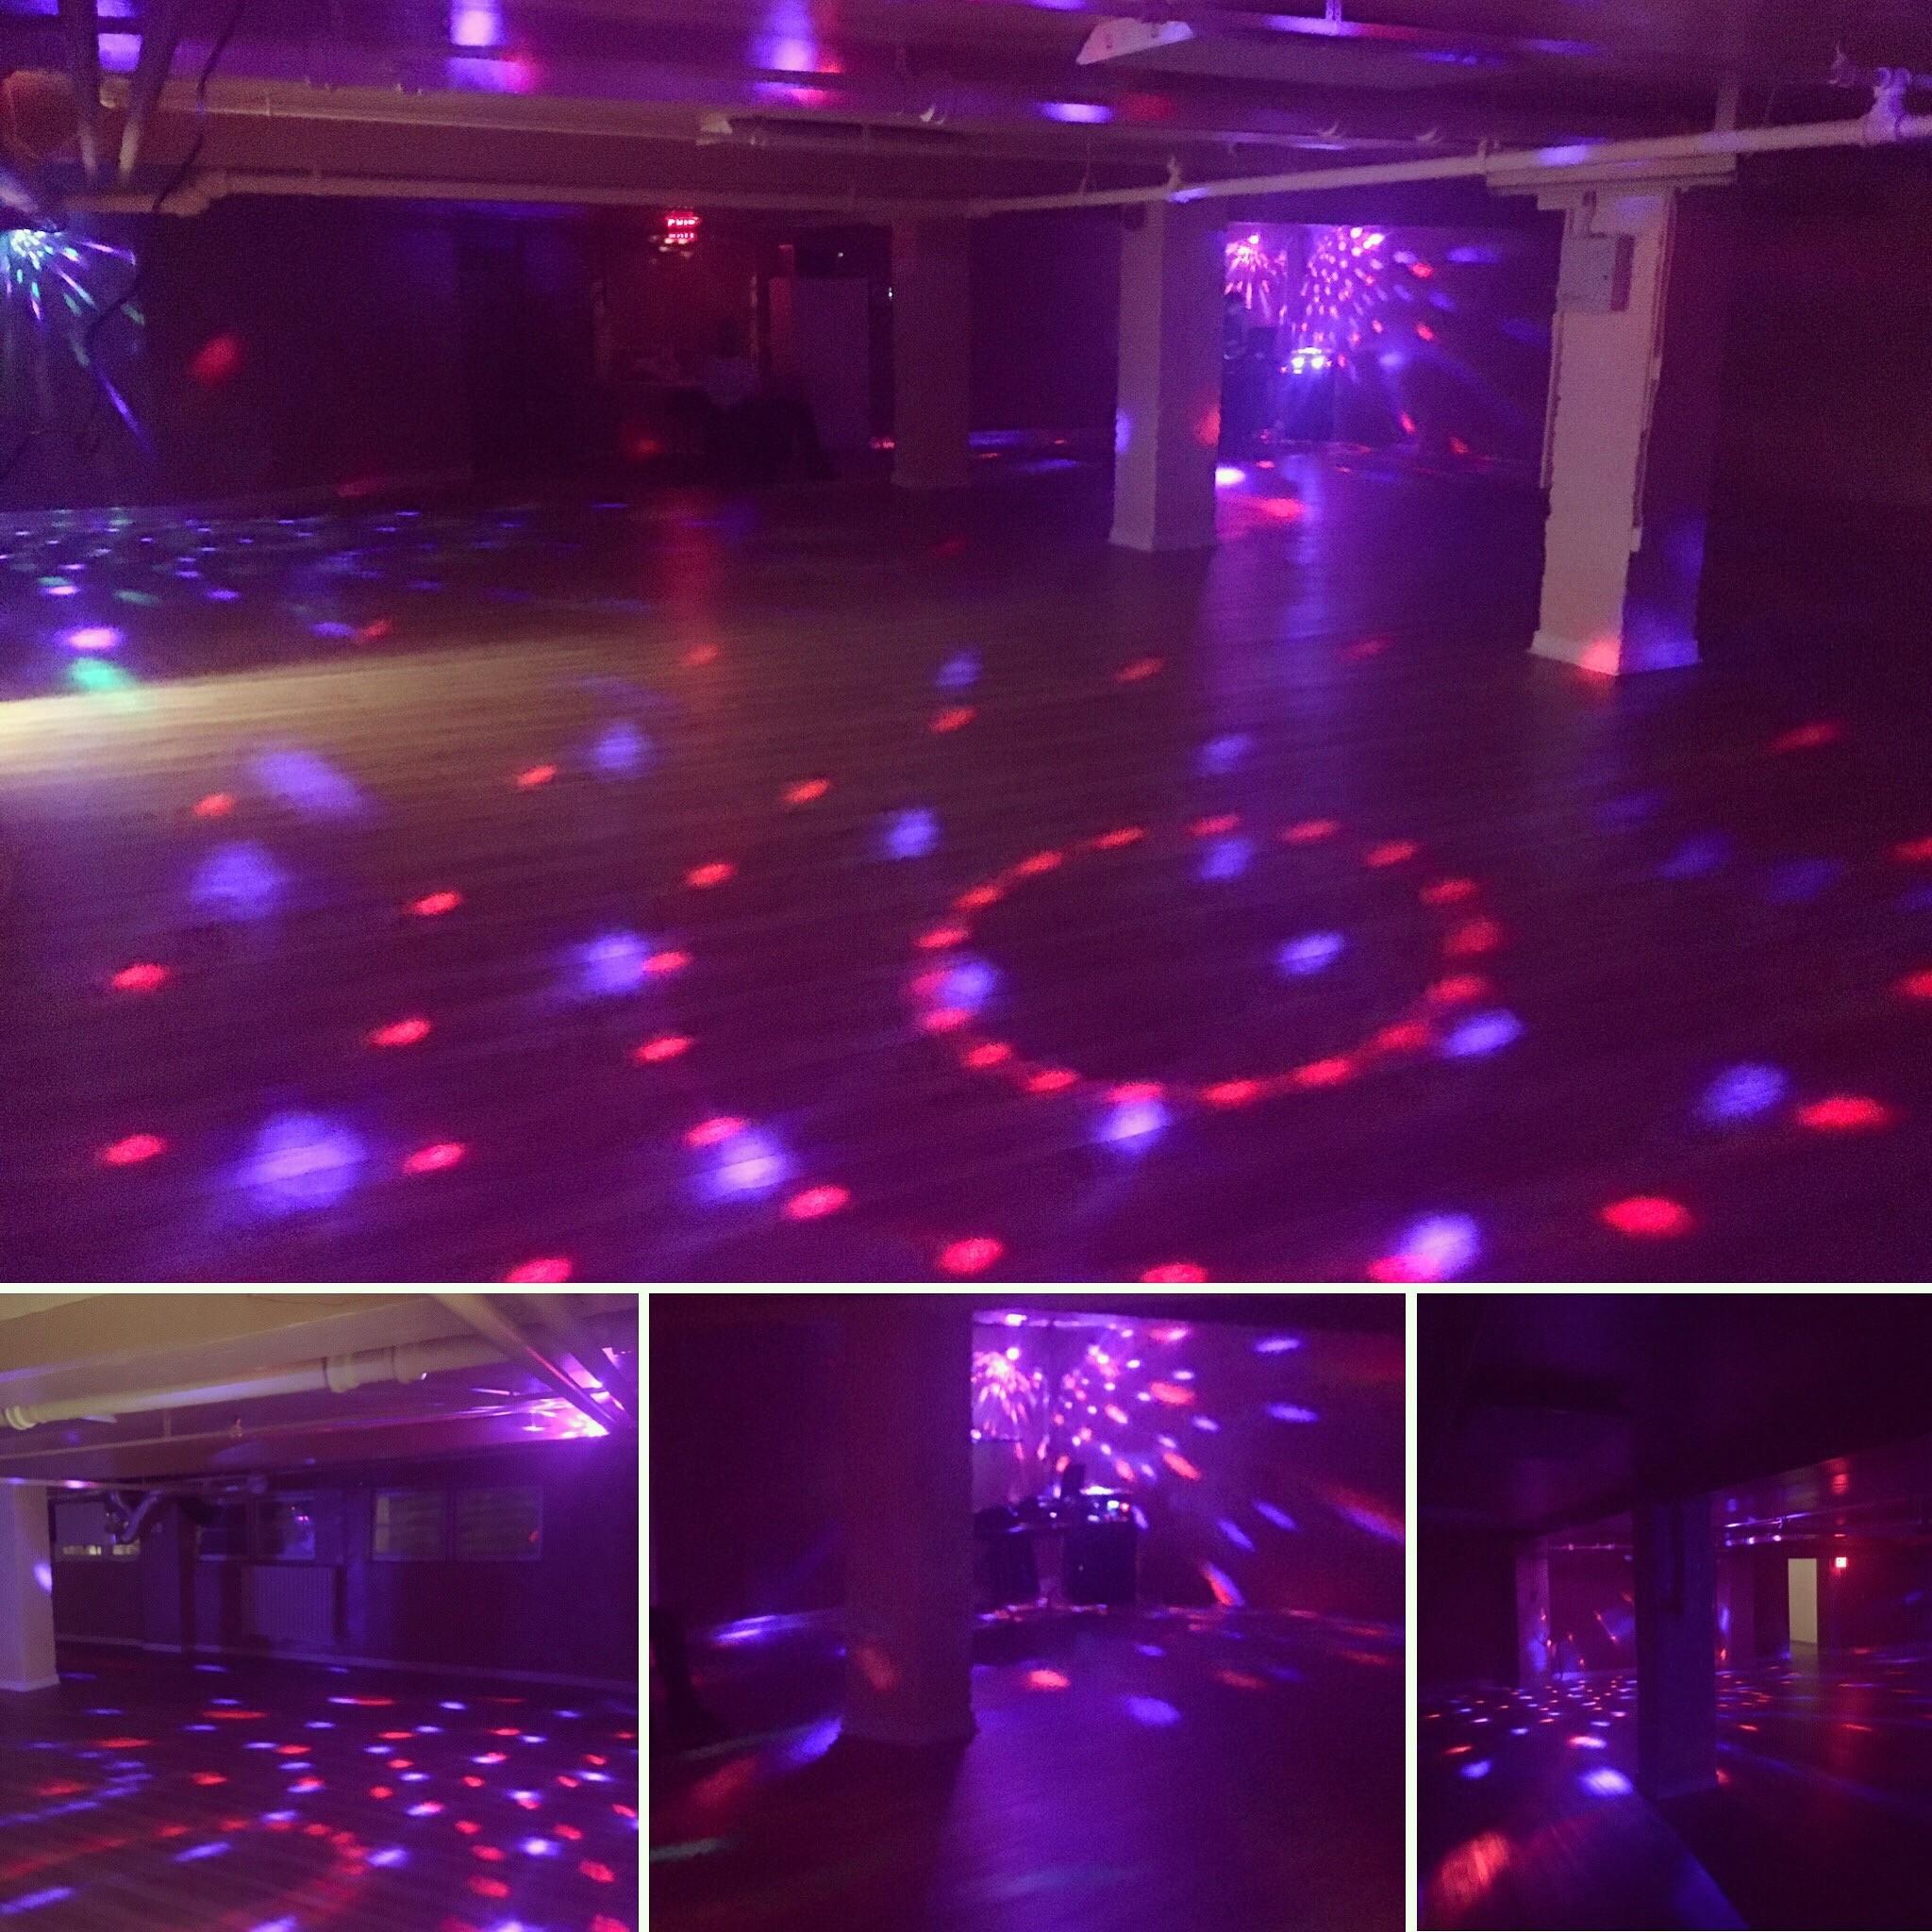 Access Ballroom Dance School Event Room Rental    Access Ballroom Dance School Event Room Rental